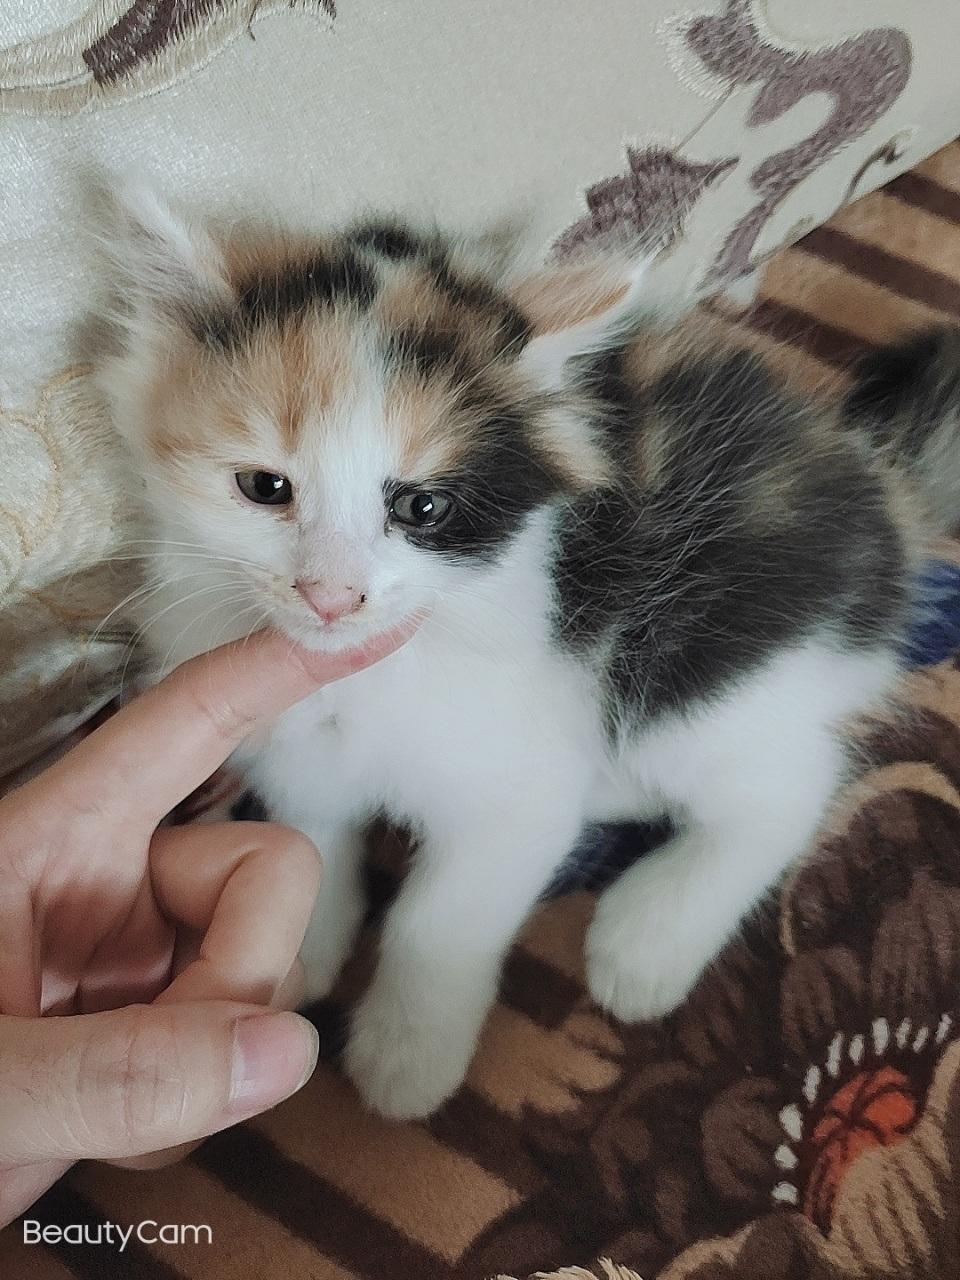 赠送小奶猫